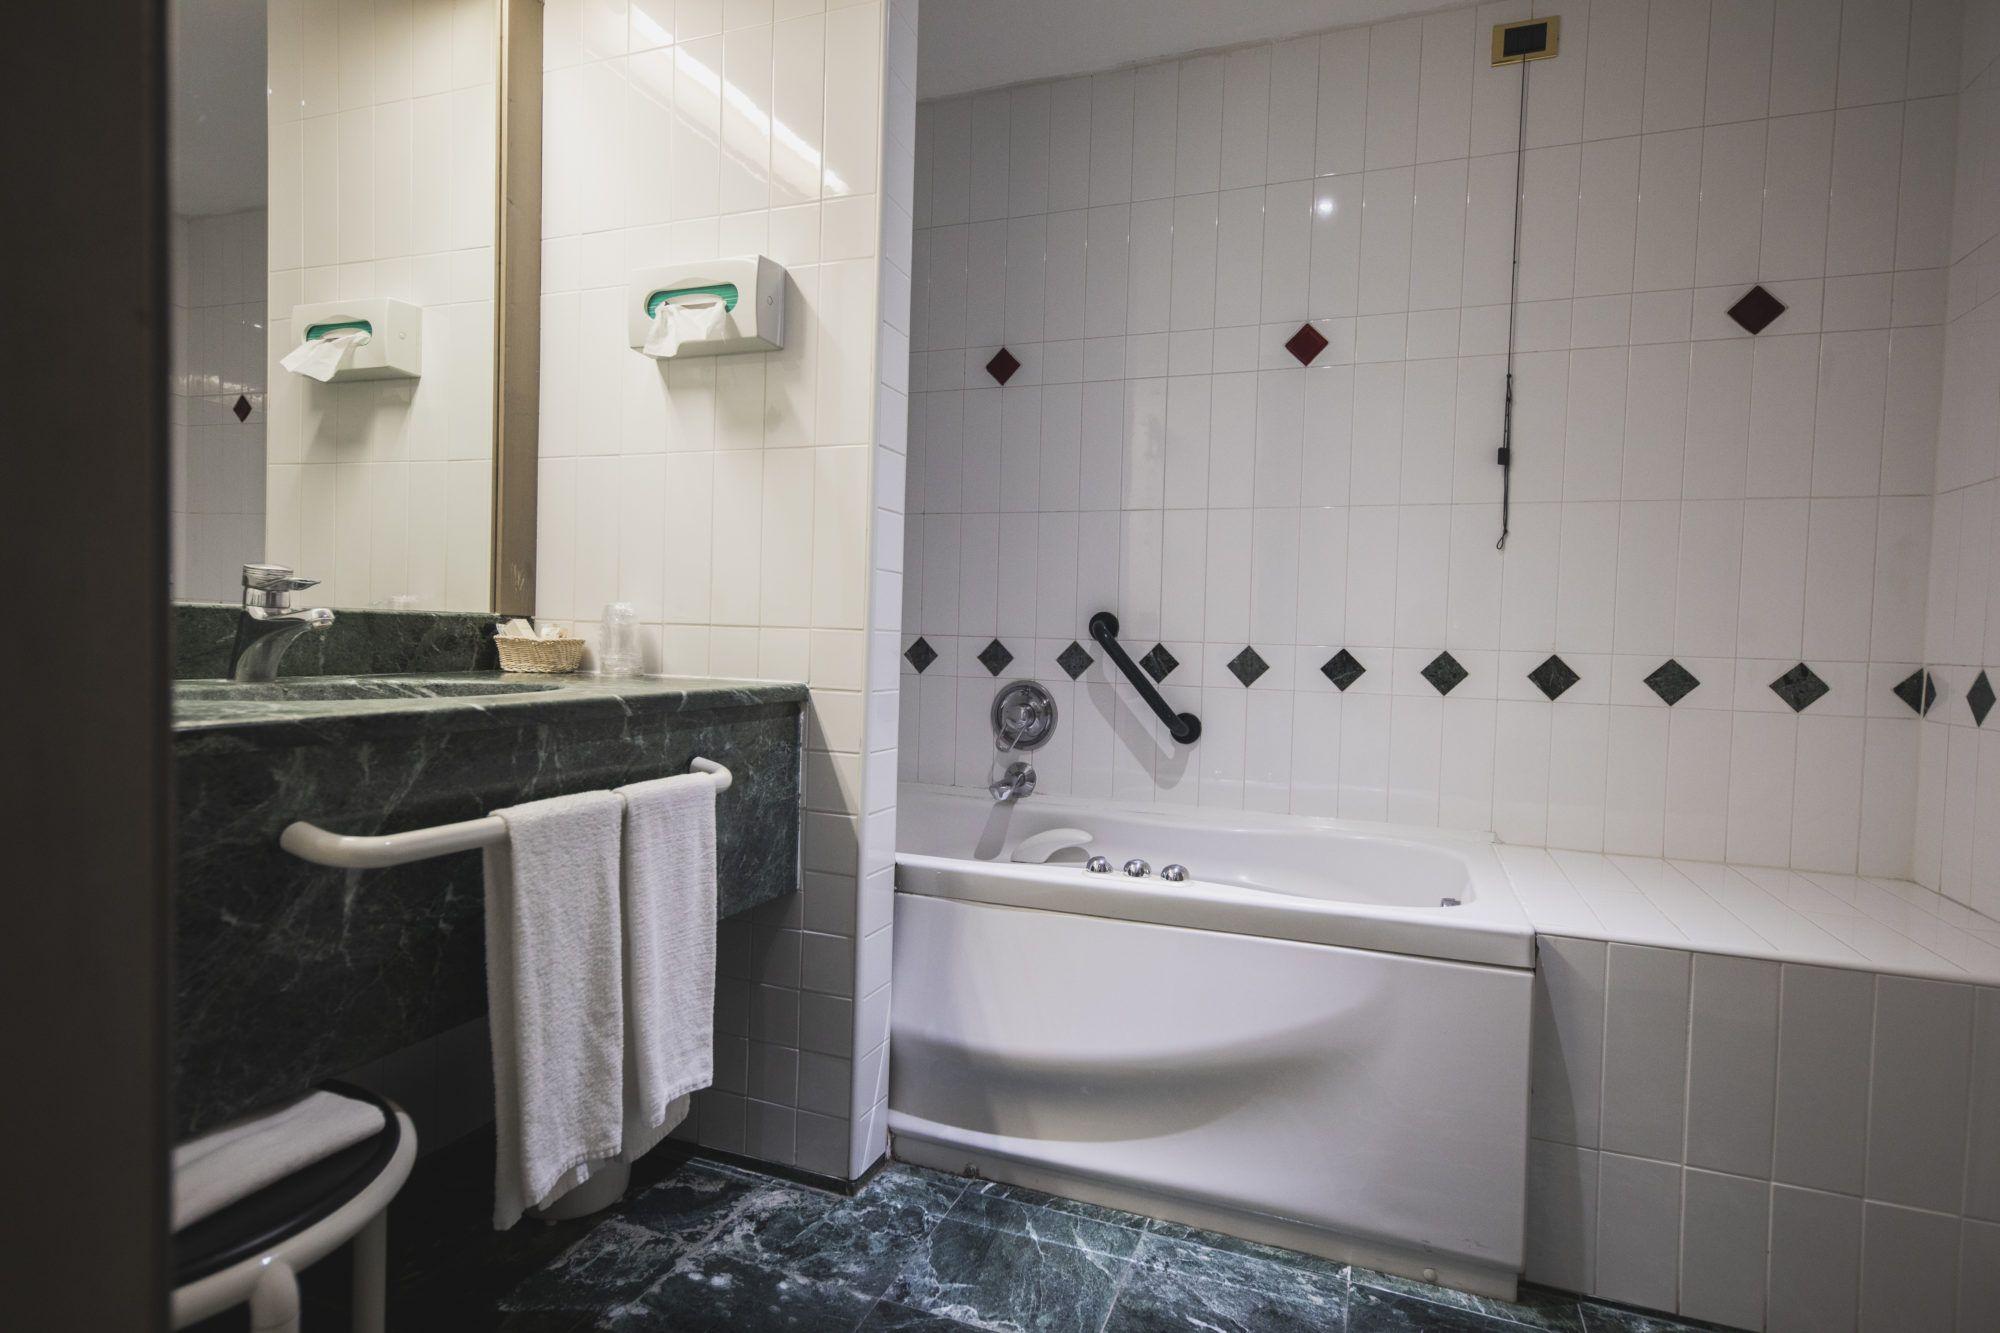 46 Hotel Rubino - Bathroom